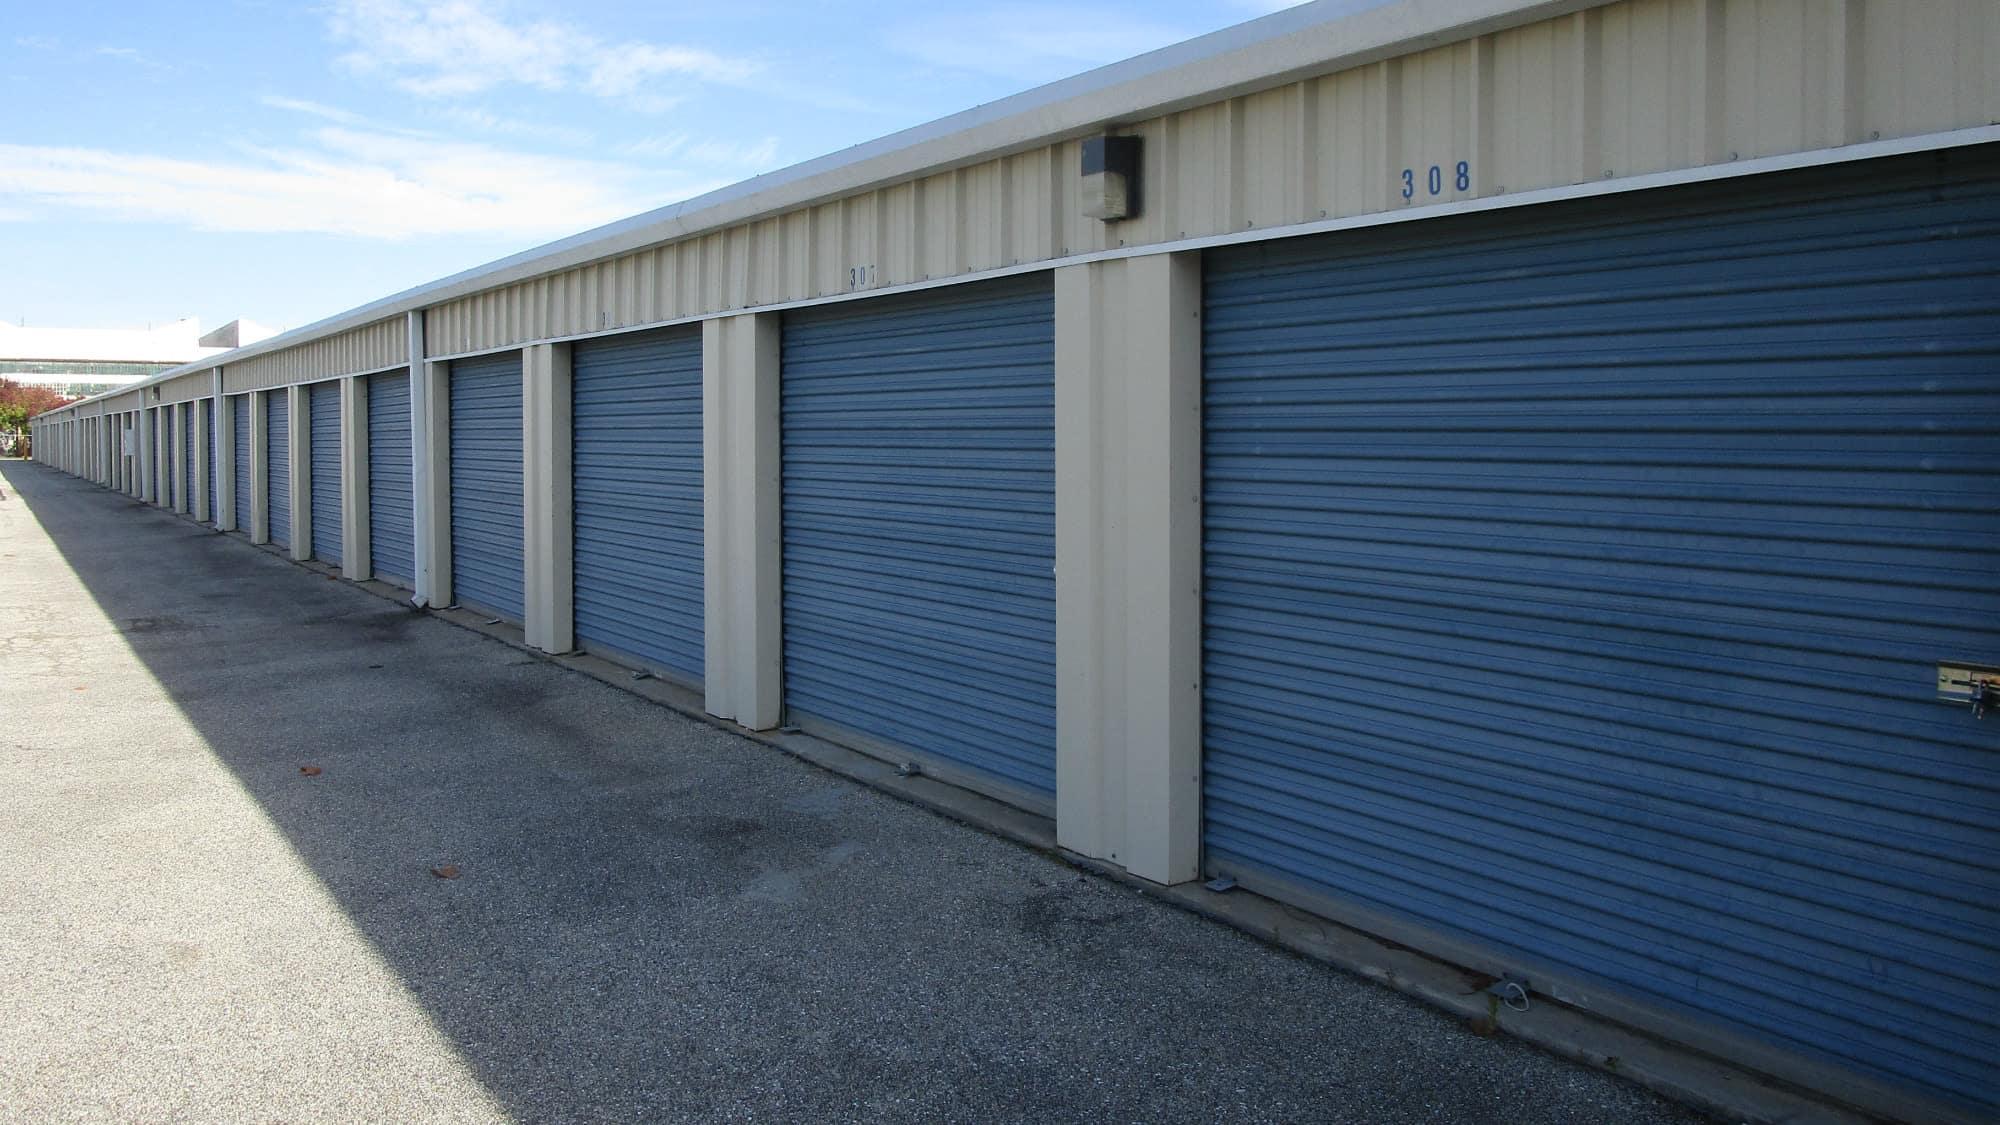 Wide driveways at Chesapeake Mini Storage in Baltimore, Maryland